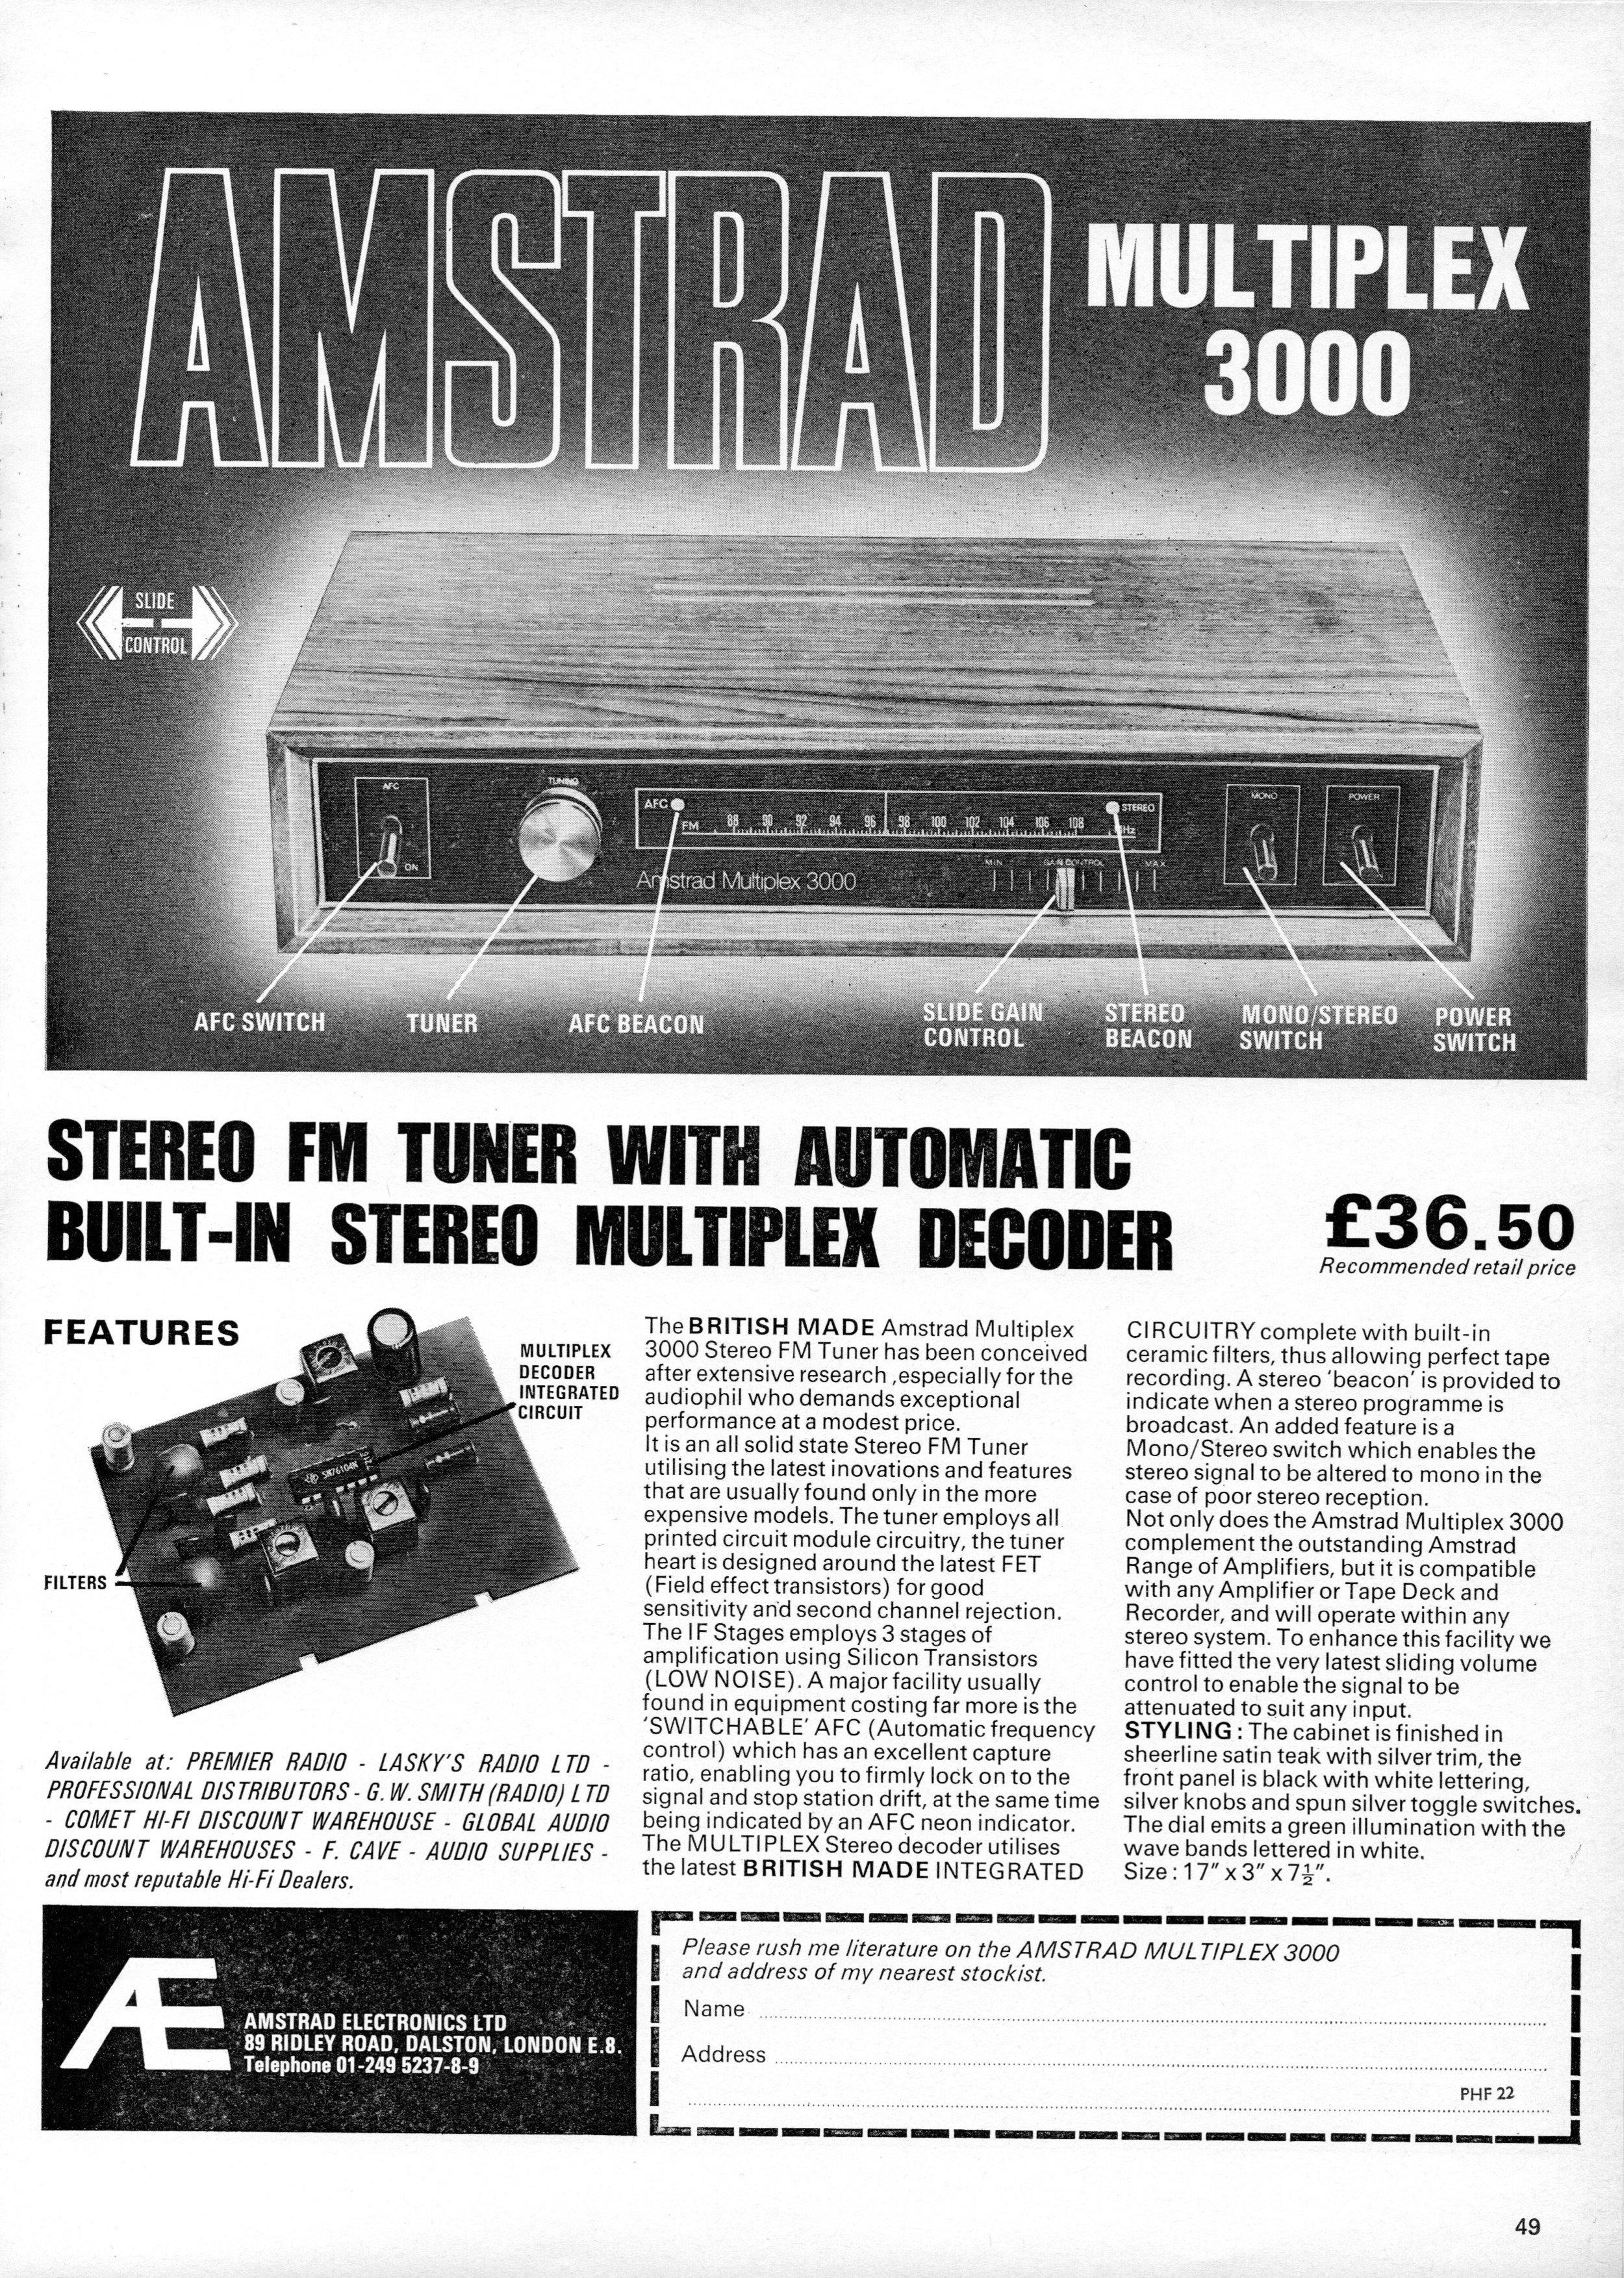 Amstrad Advert Multiplex 3000 1972.jpg